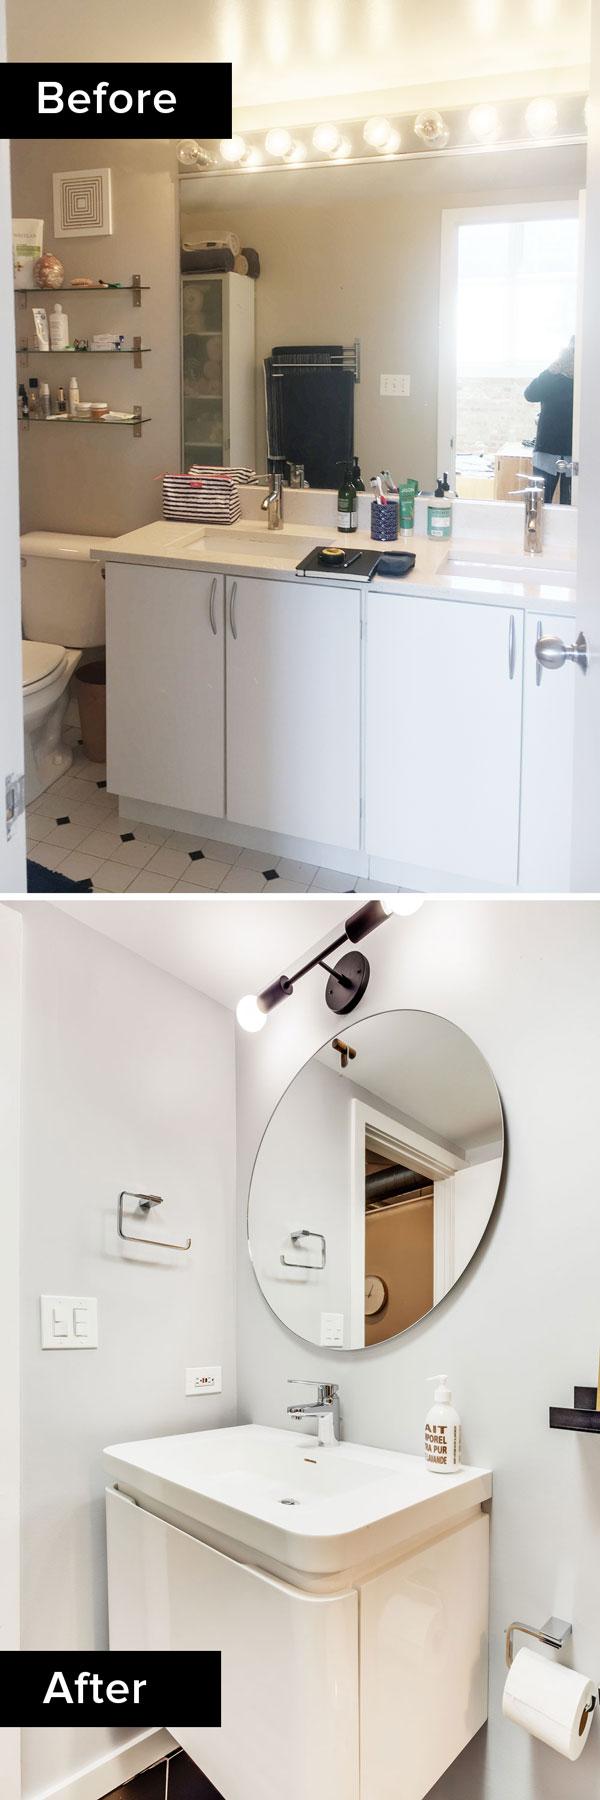 before and after bathroom remodel, Chicago interior designer